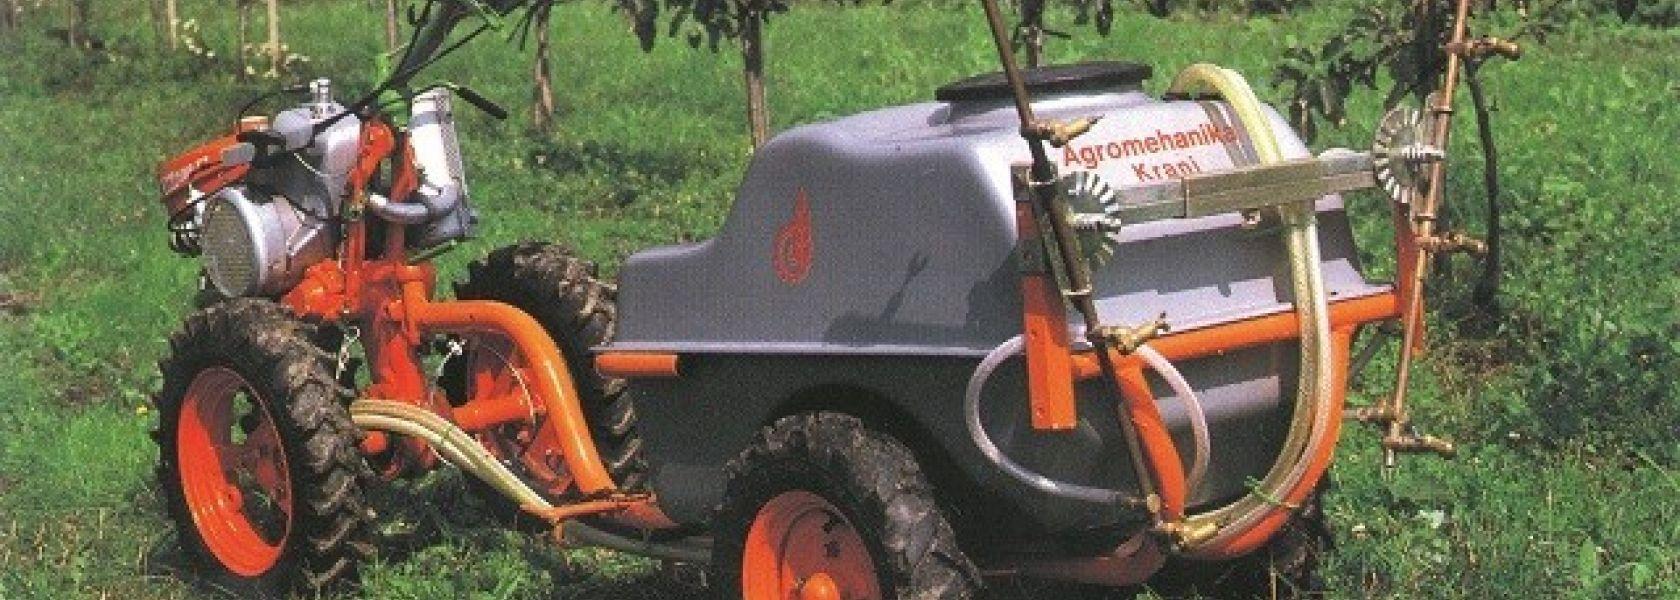 Ags 150 Fur Bodenfrasen Artikel Agromehanika D D